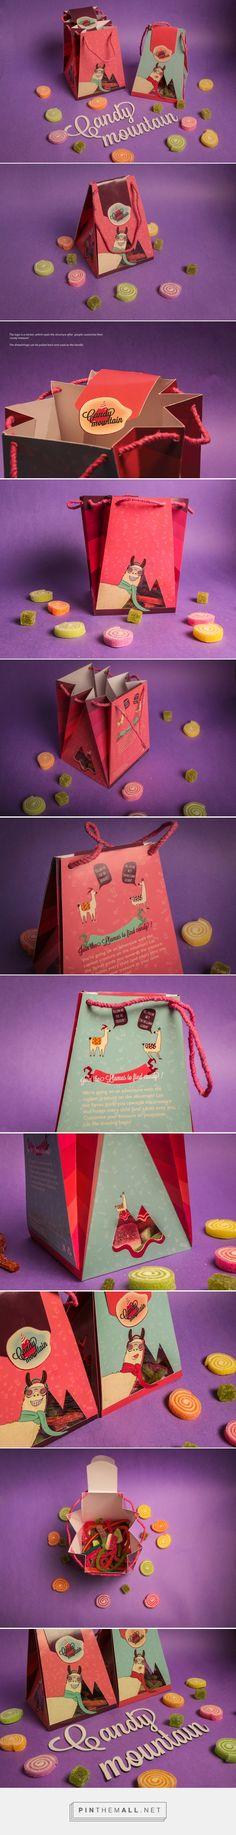 Candy Mountain Packaging by Avishya Shetty, Zena Corda